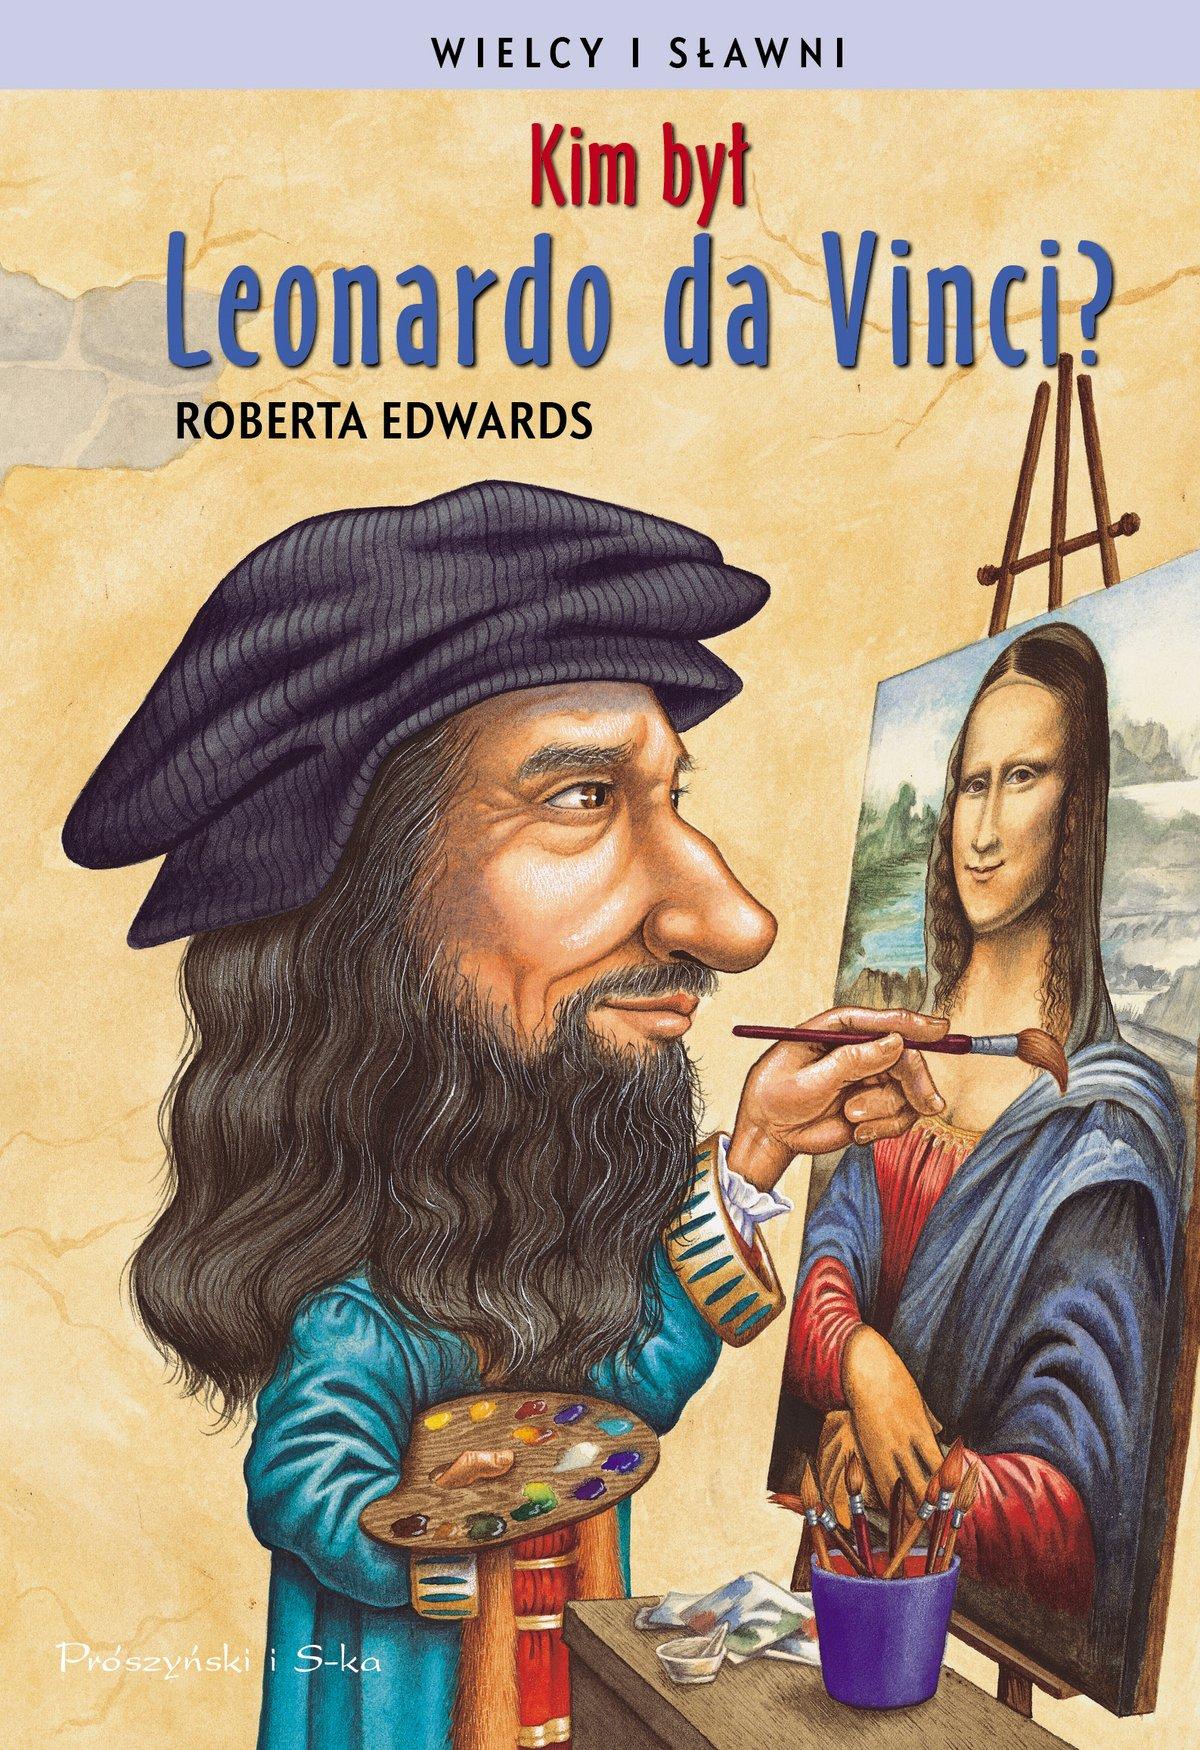 Kim był Leonardo da Vinci ? - Ebook (Książka na Kindle) do pobrania w formacie MOBI